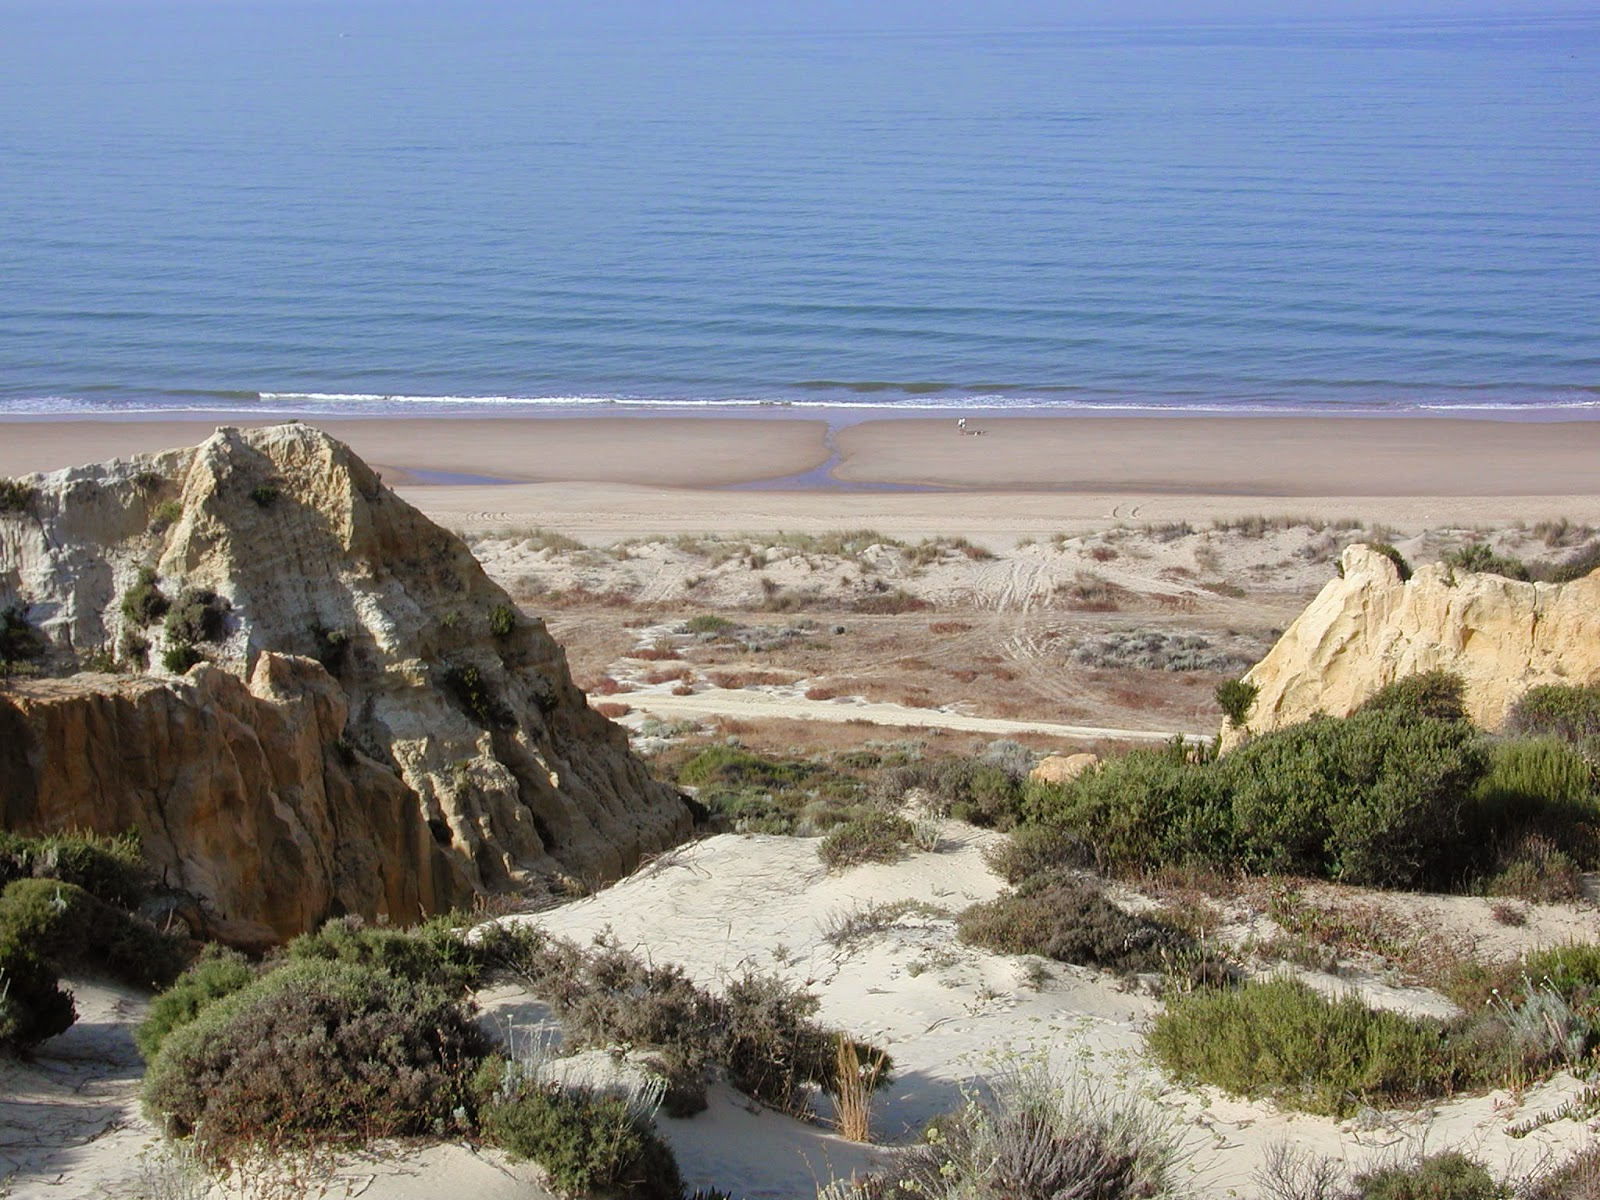 playas de huelva, huelva, beachs, playas, las mejores playas, las mejores playas de huelva, huelva, españa, andalucia